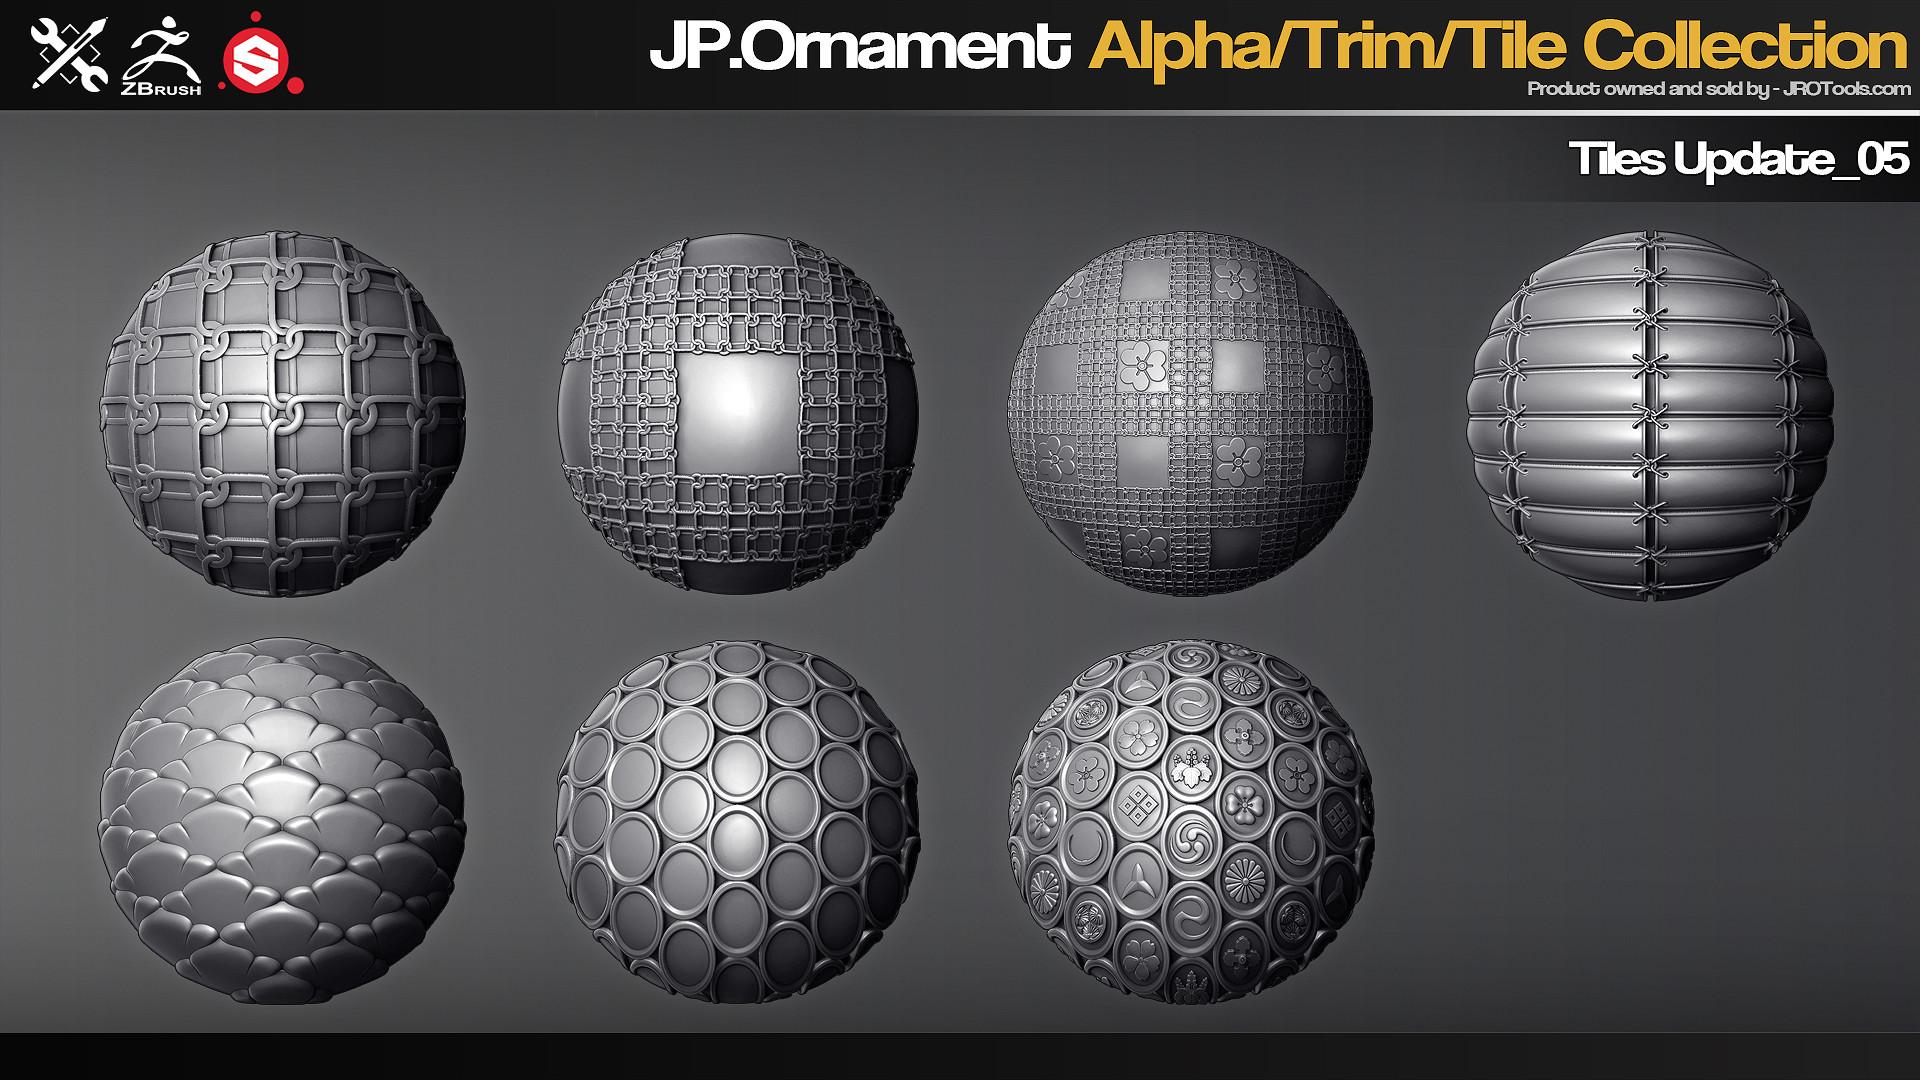 Jonas ronnegard tile update 05 01